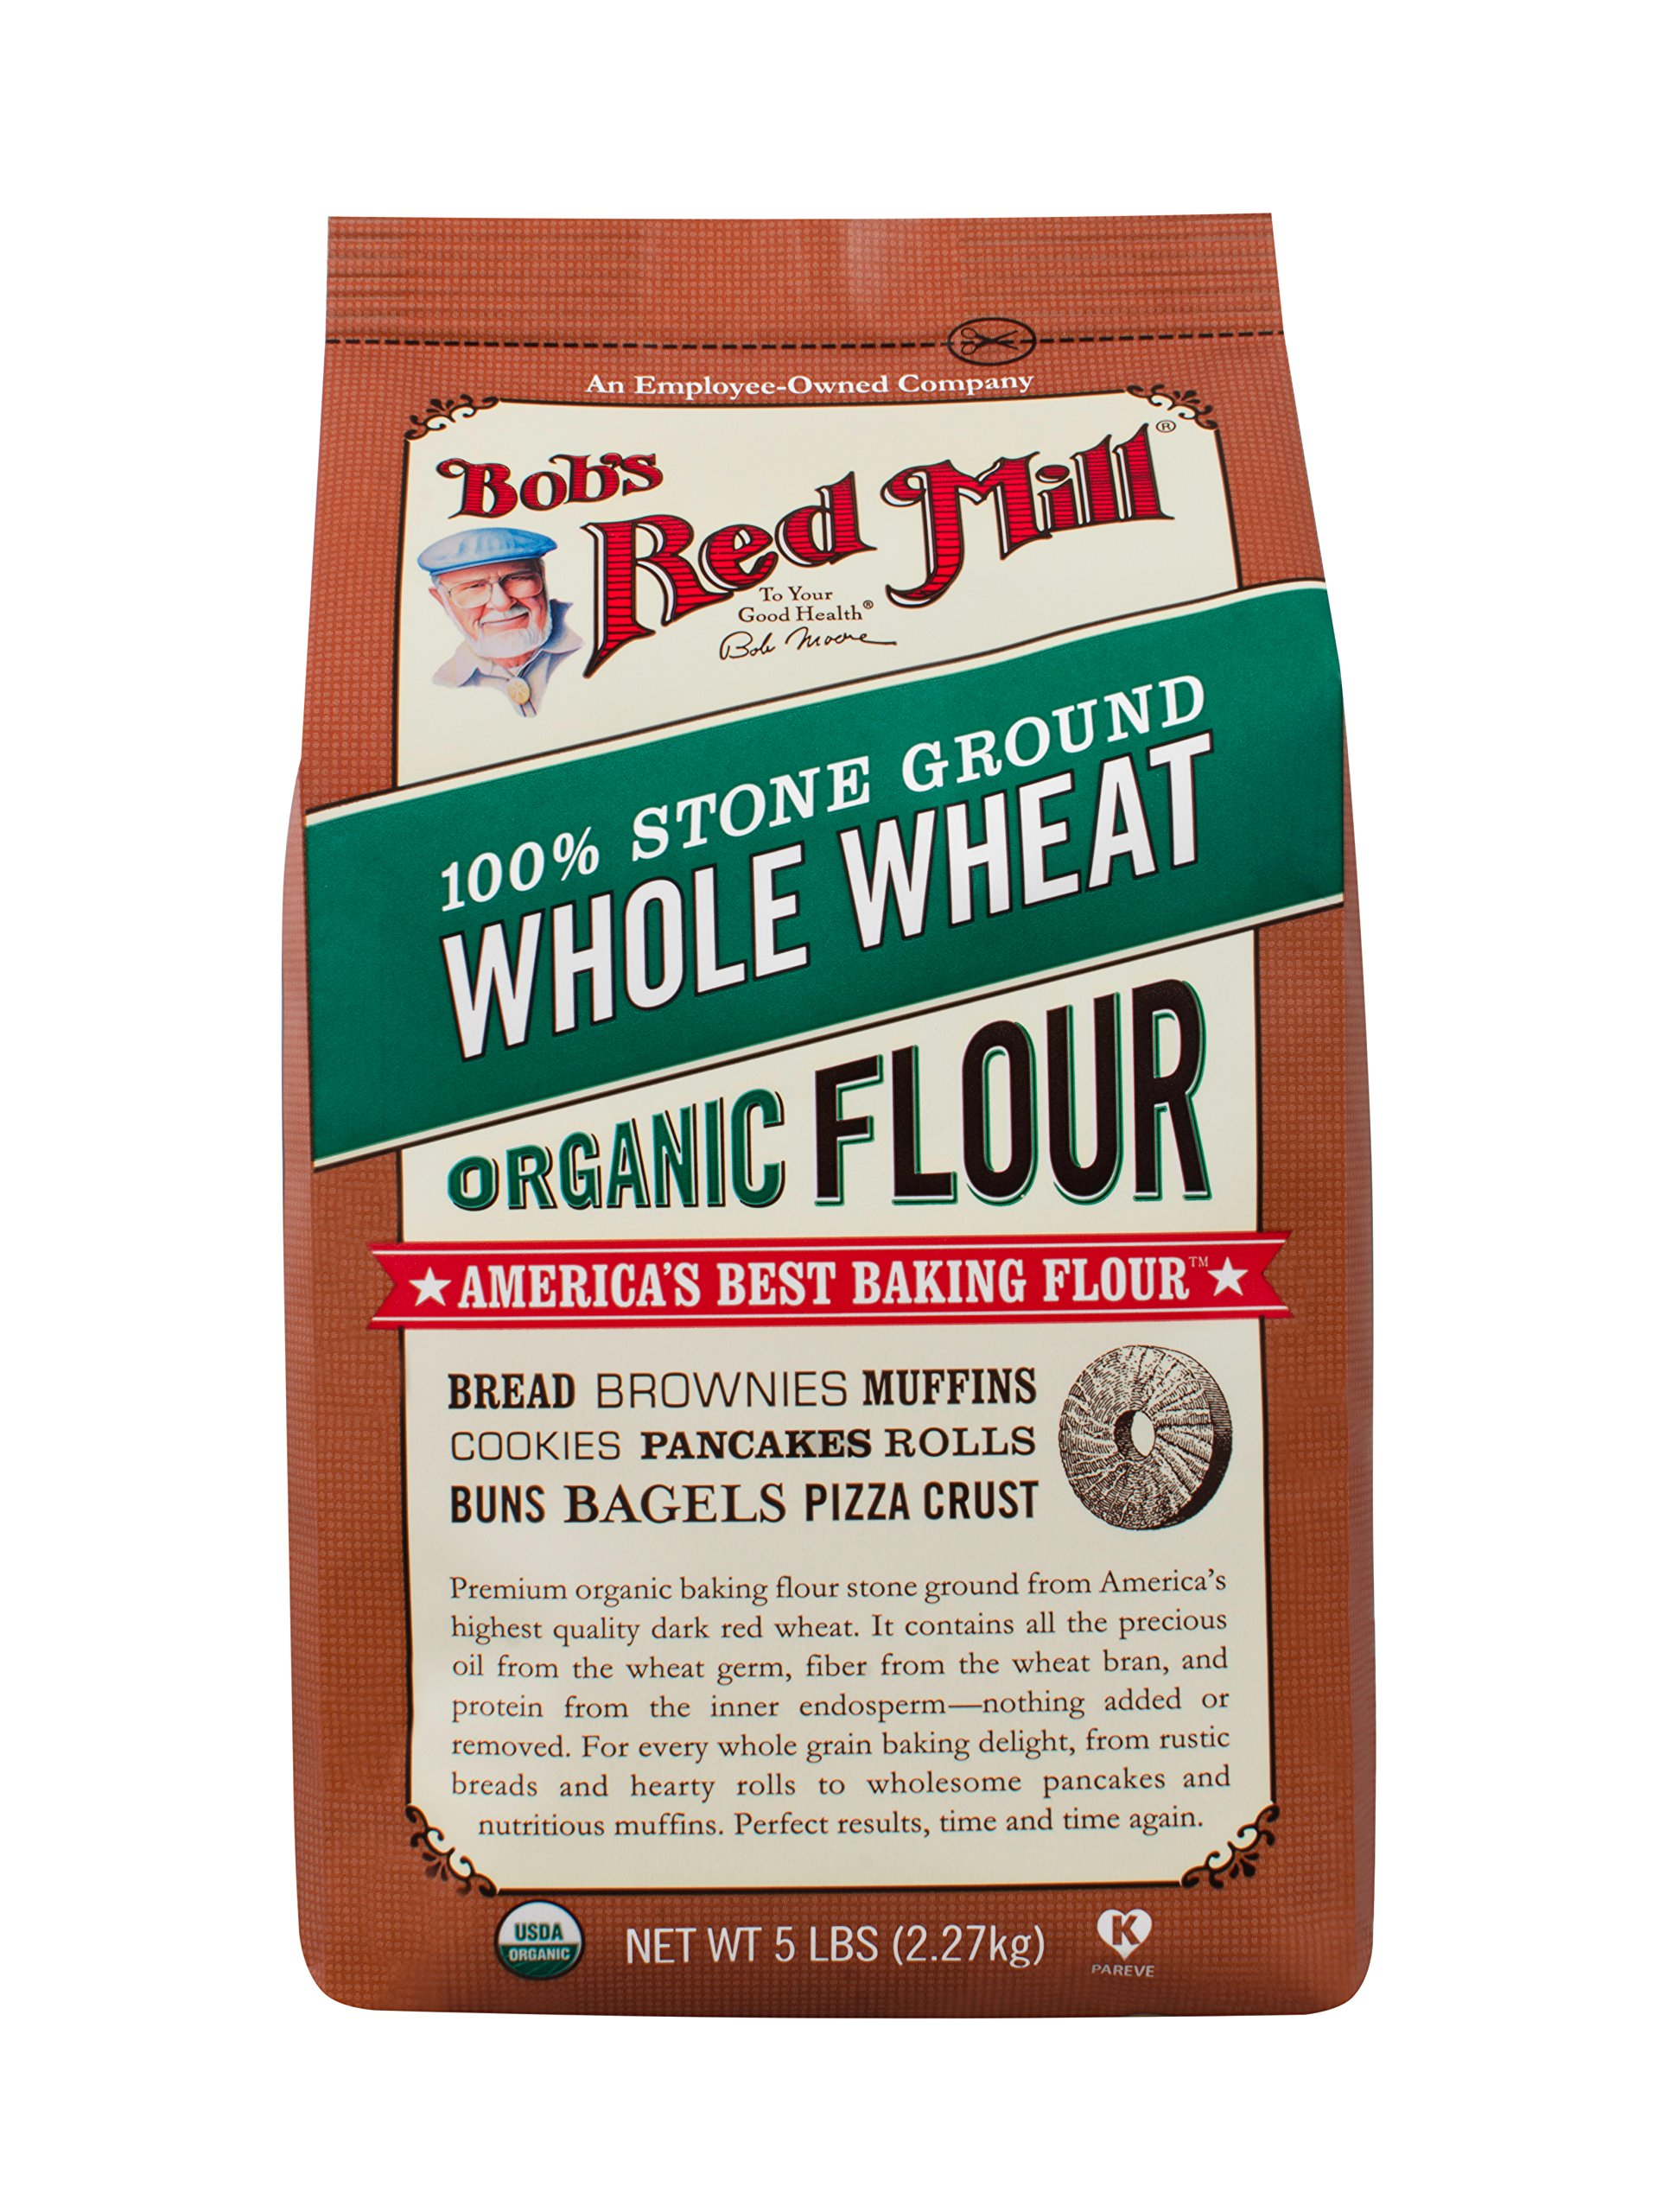 Bob's Red Mill, Organic Flour, Whole Wheat, 5 lb